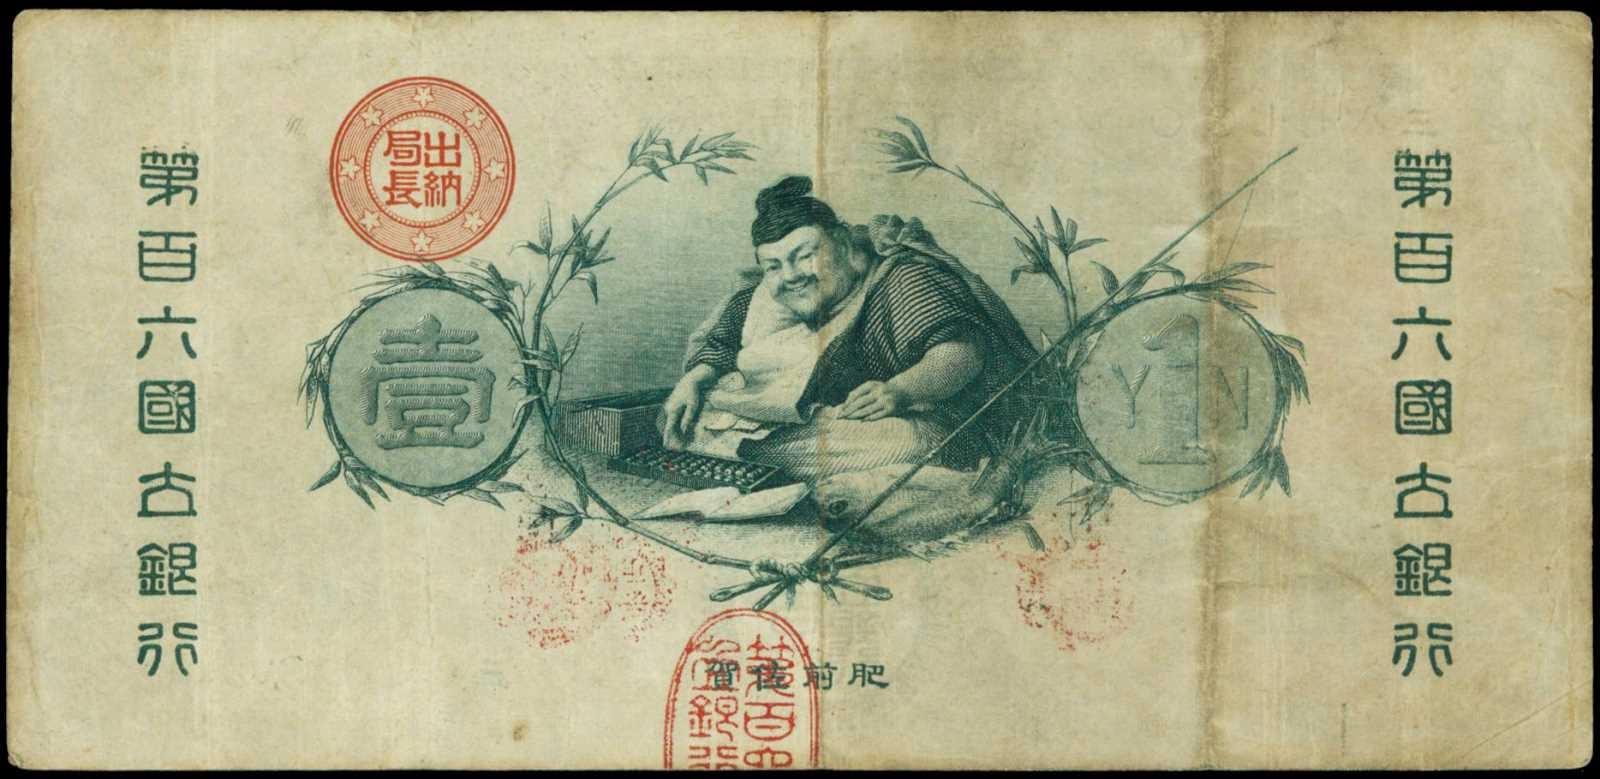 Japan Banknotes 1 Yen Ebisu 1877 Great Imperial Japanese National Bank